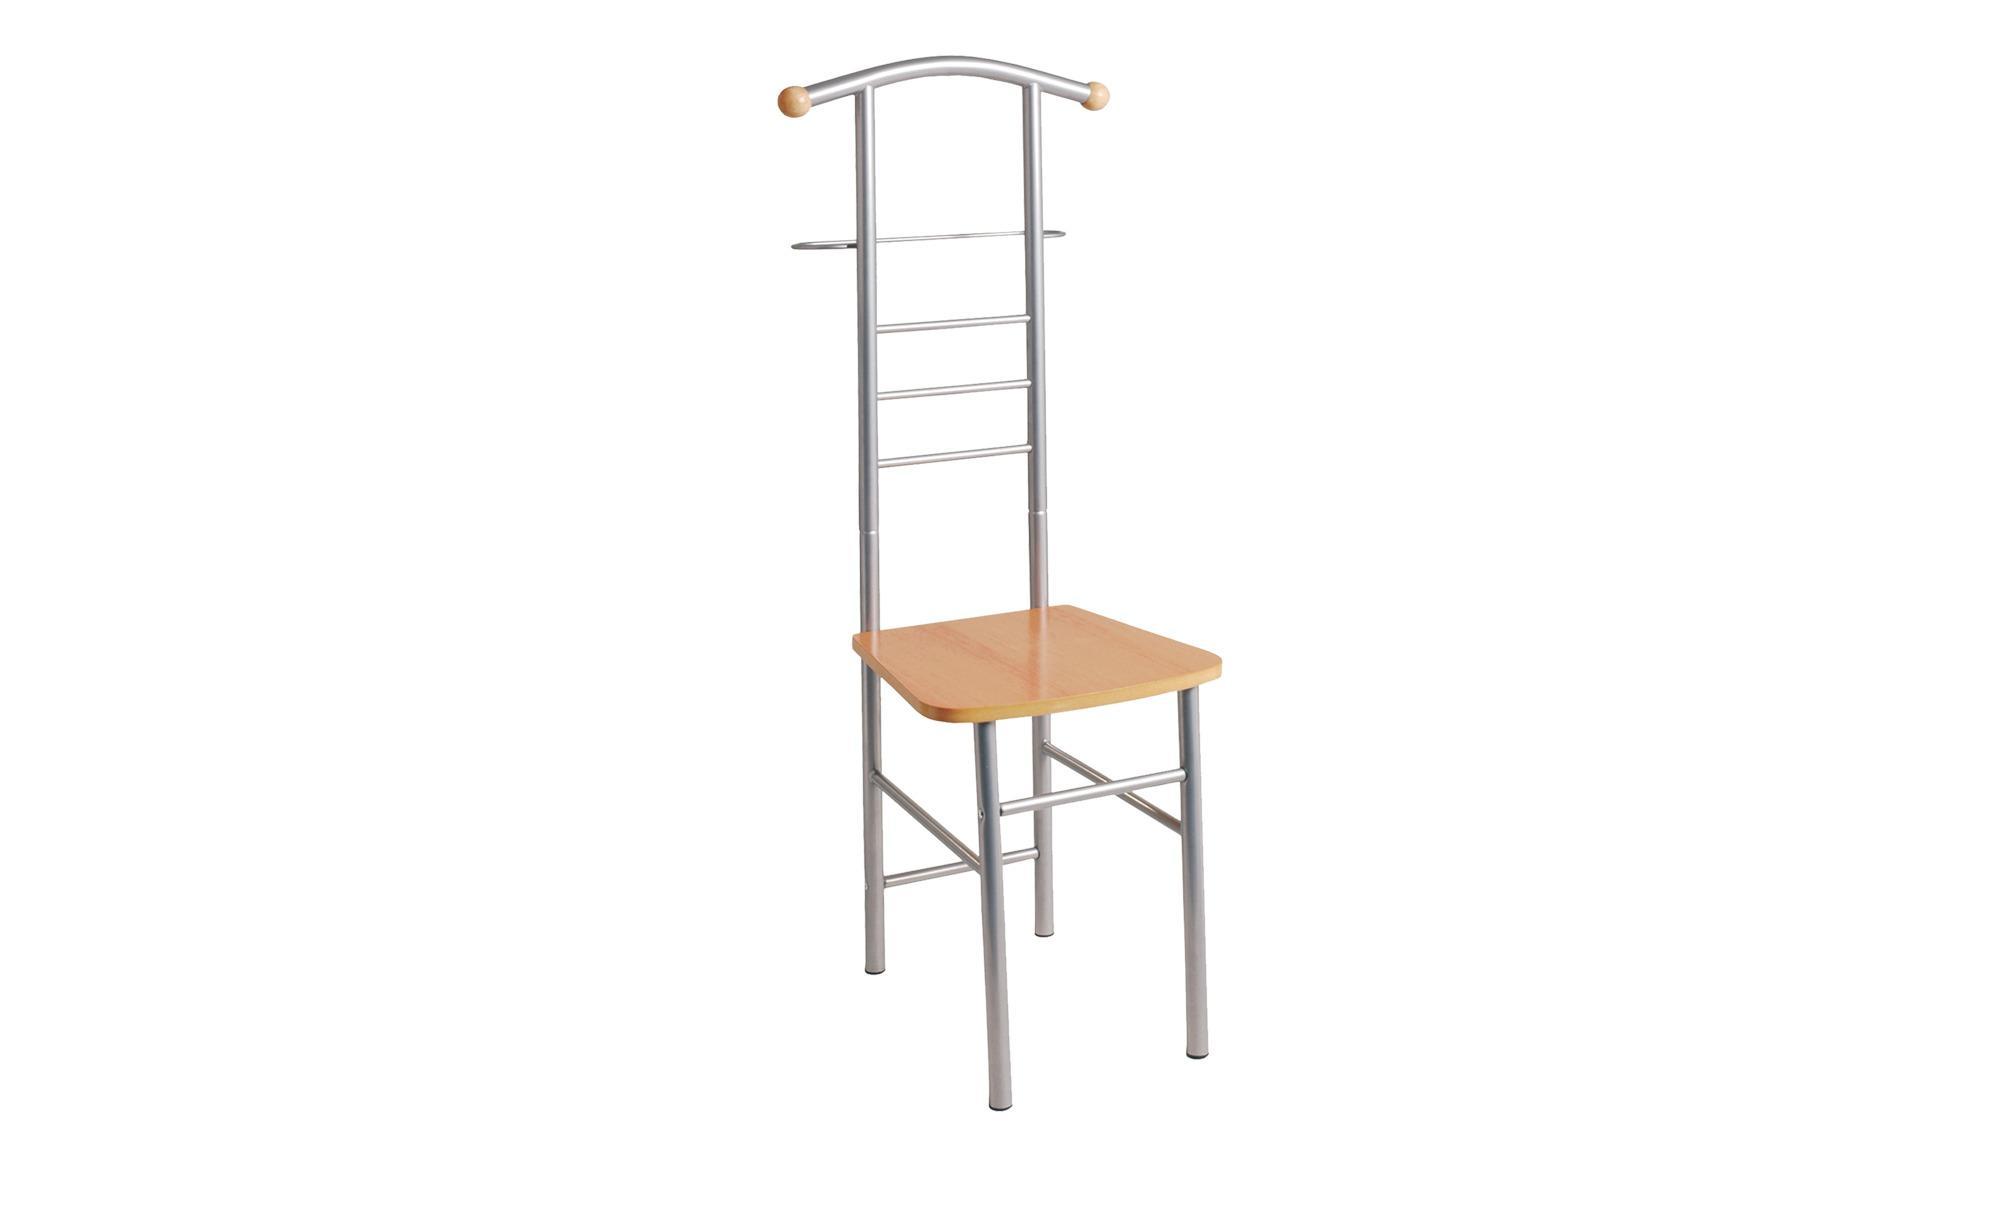 Herrendienerstuhl - holzfarben - Möbel Kraft